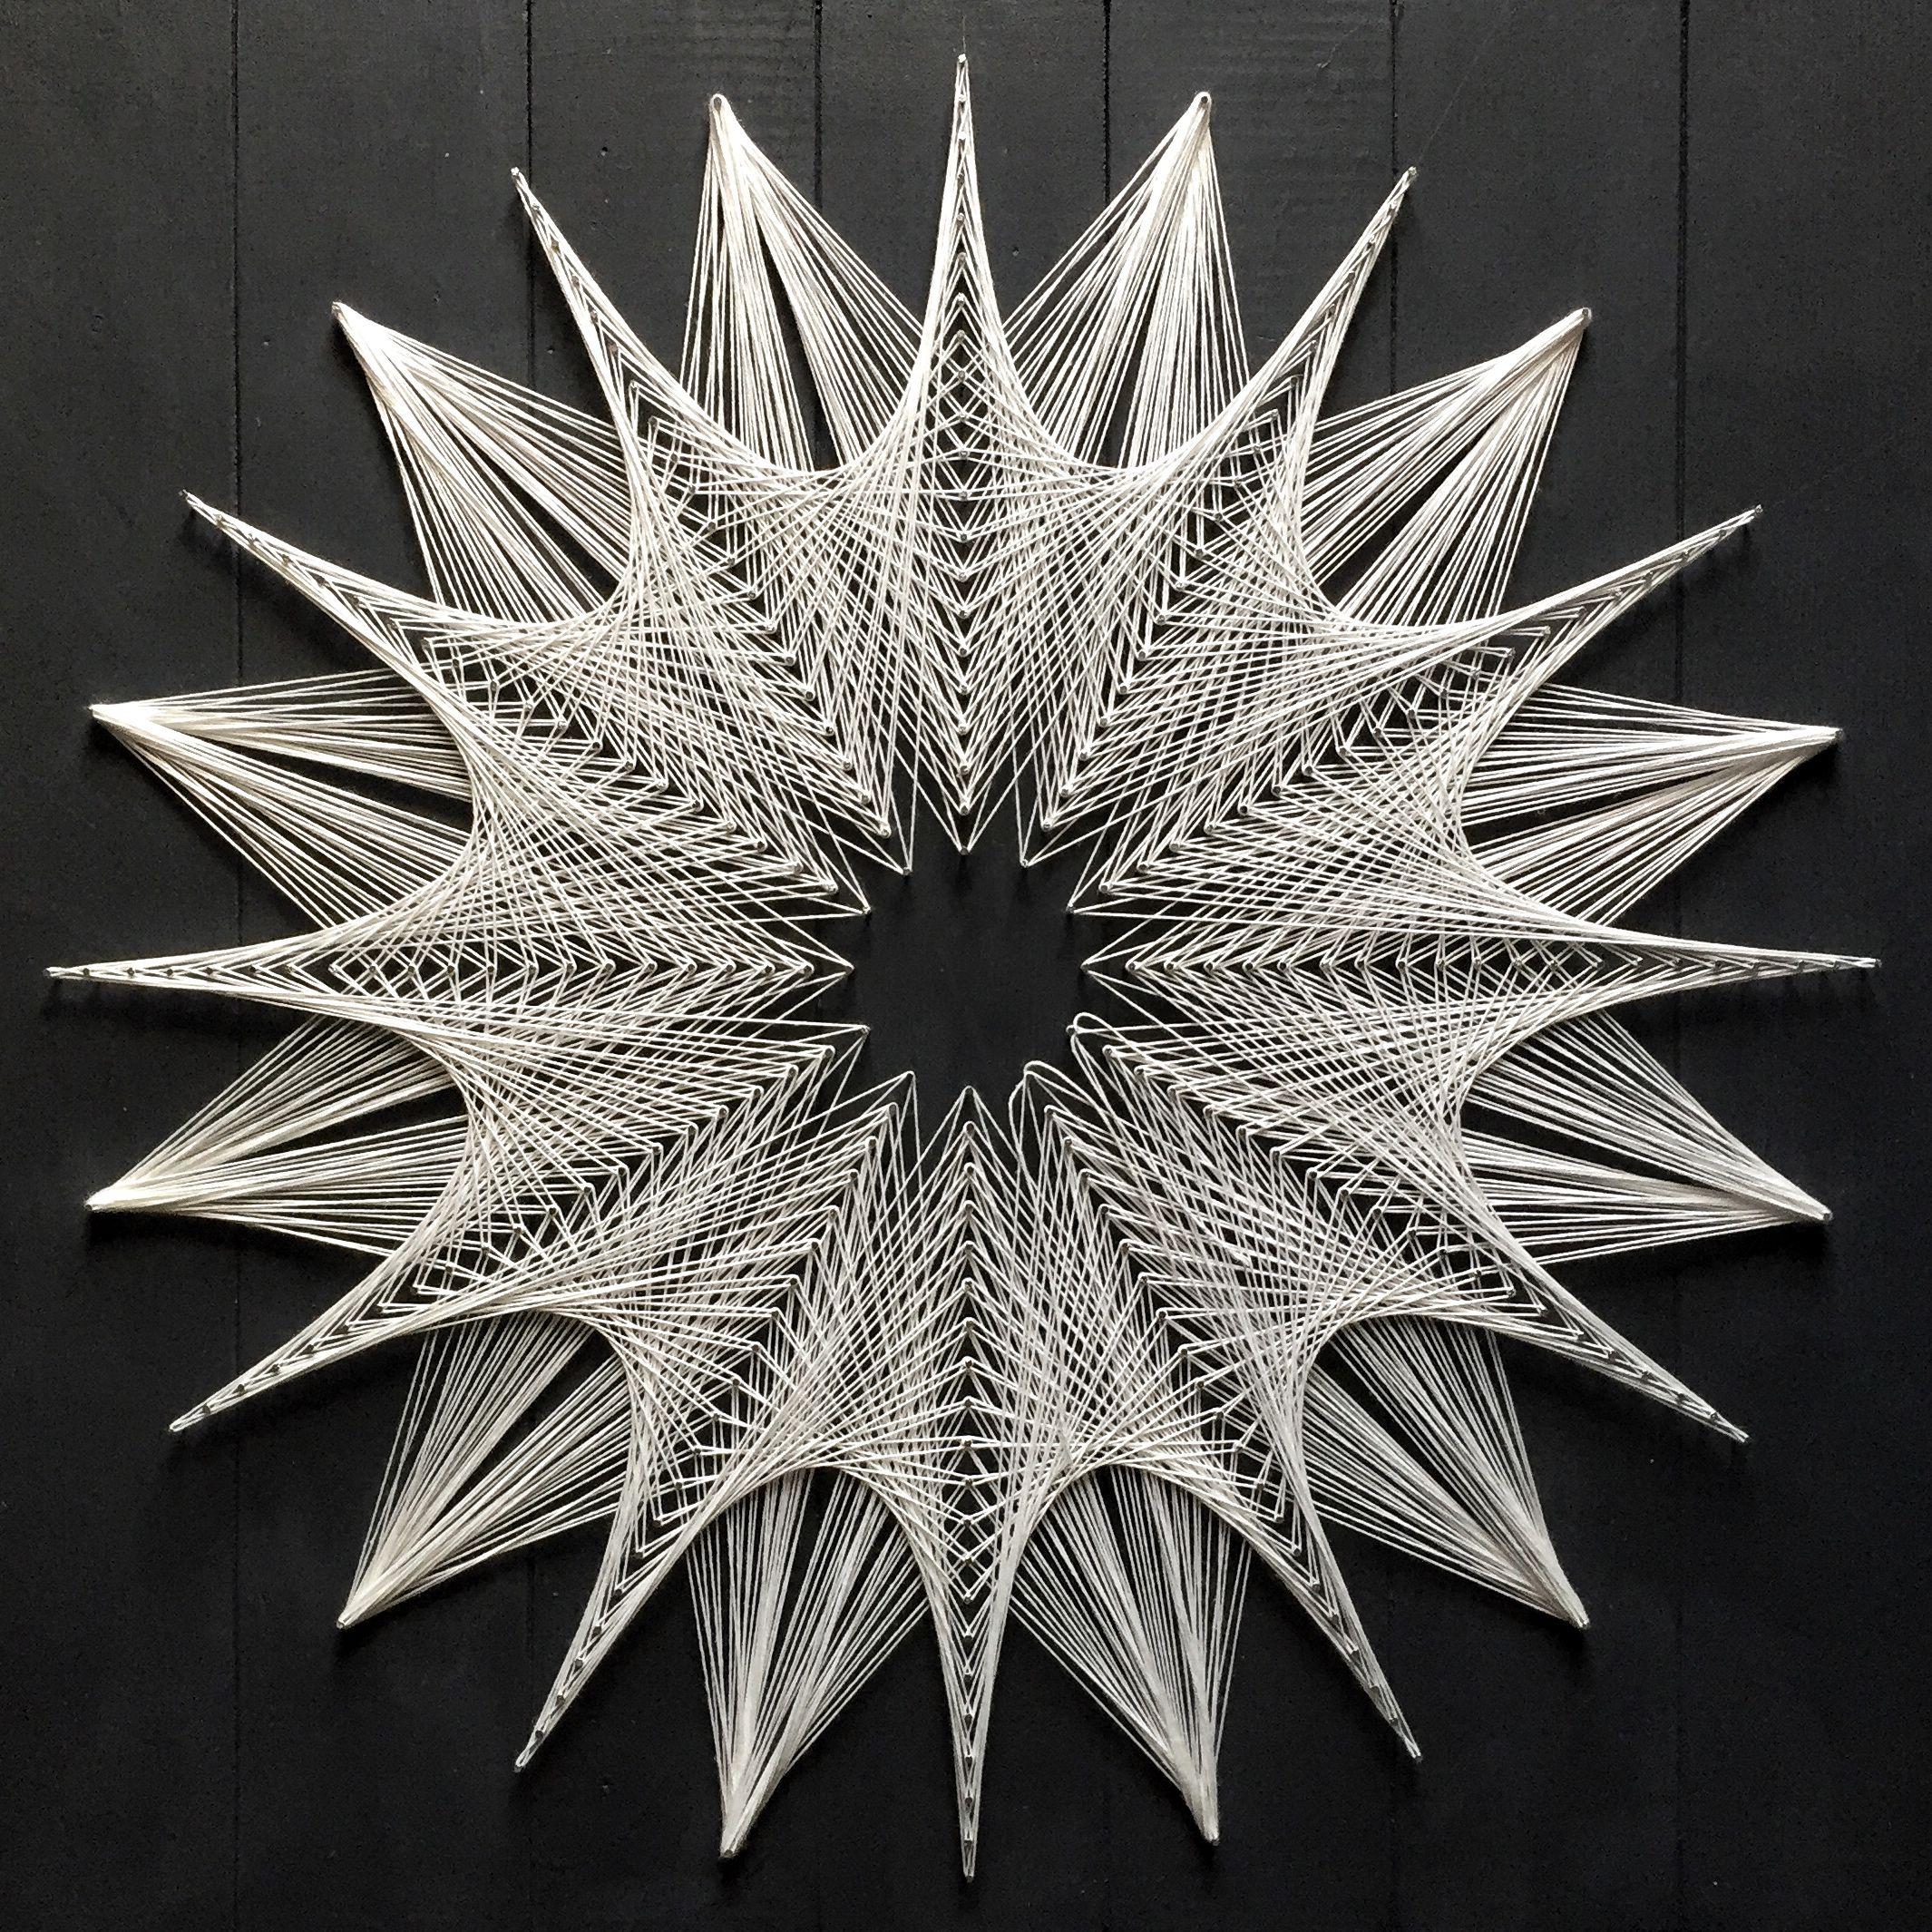 27 Pin on Arts & Crafts